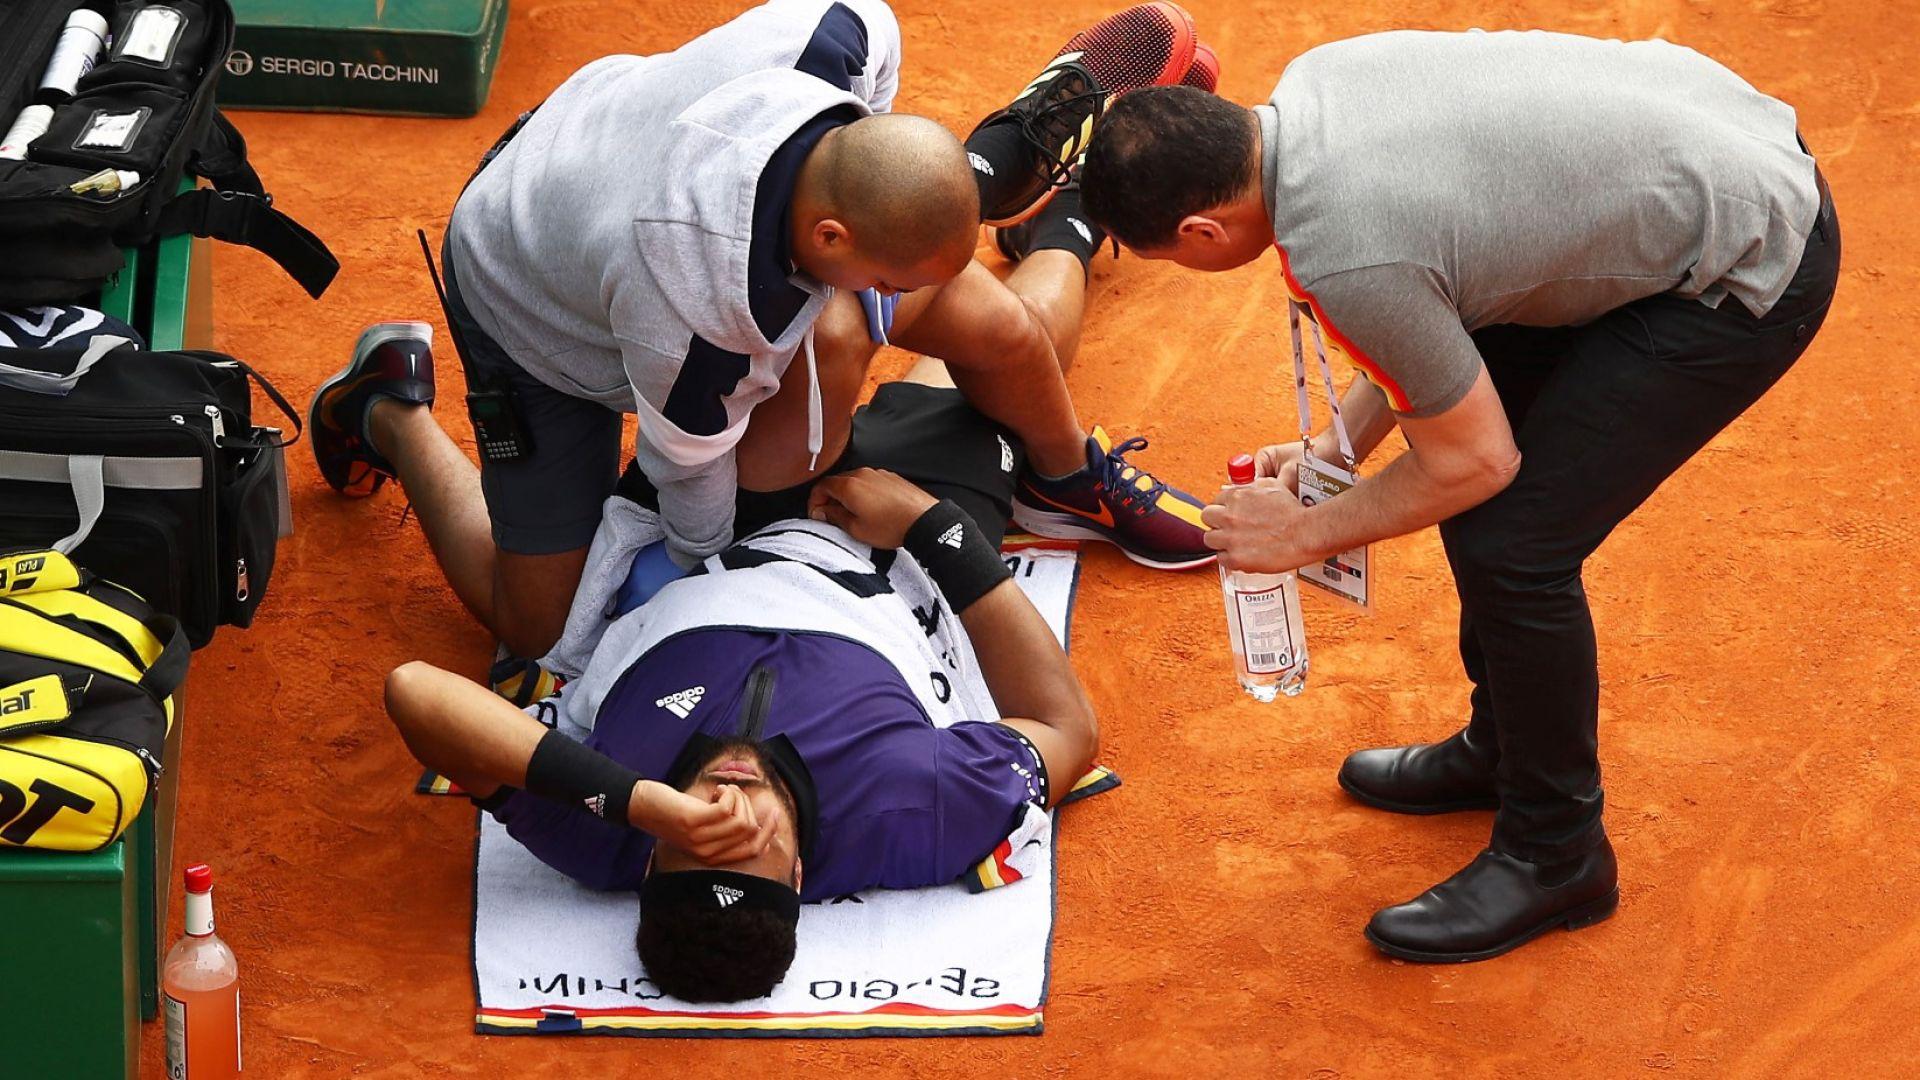 Нова травма спря Цонга в Монте Карло